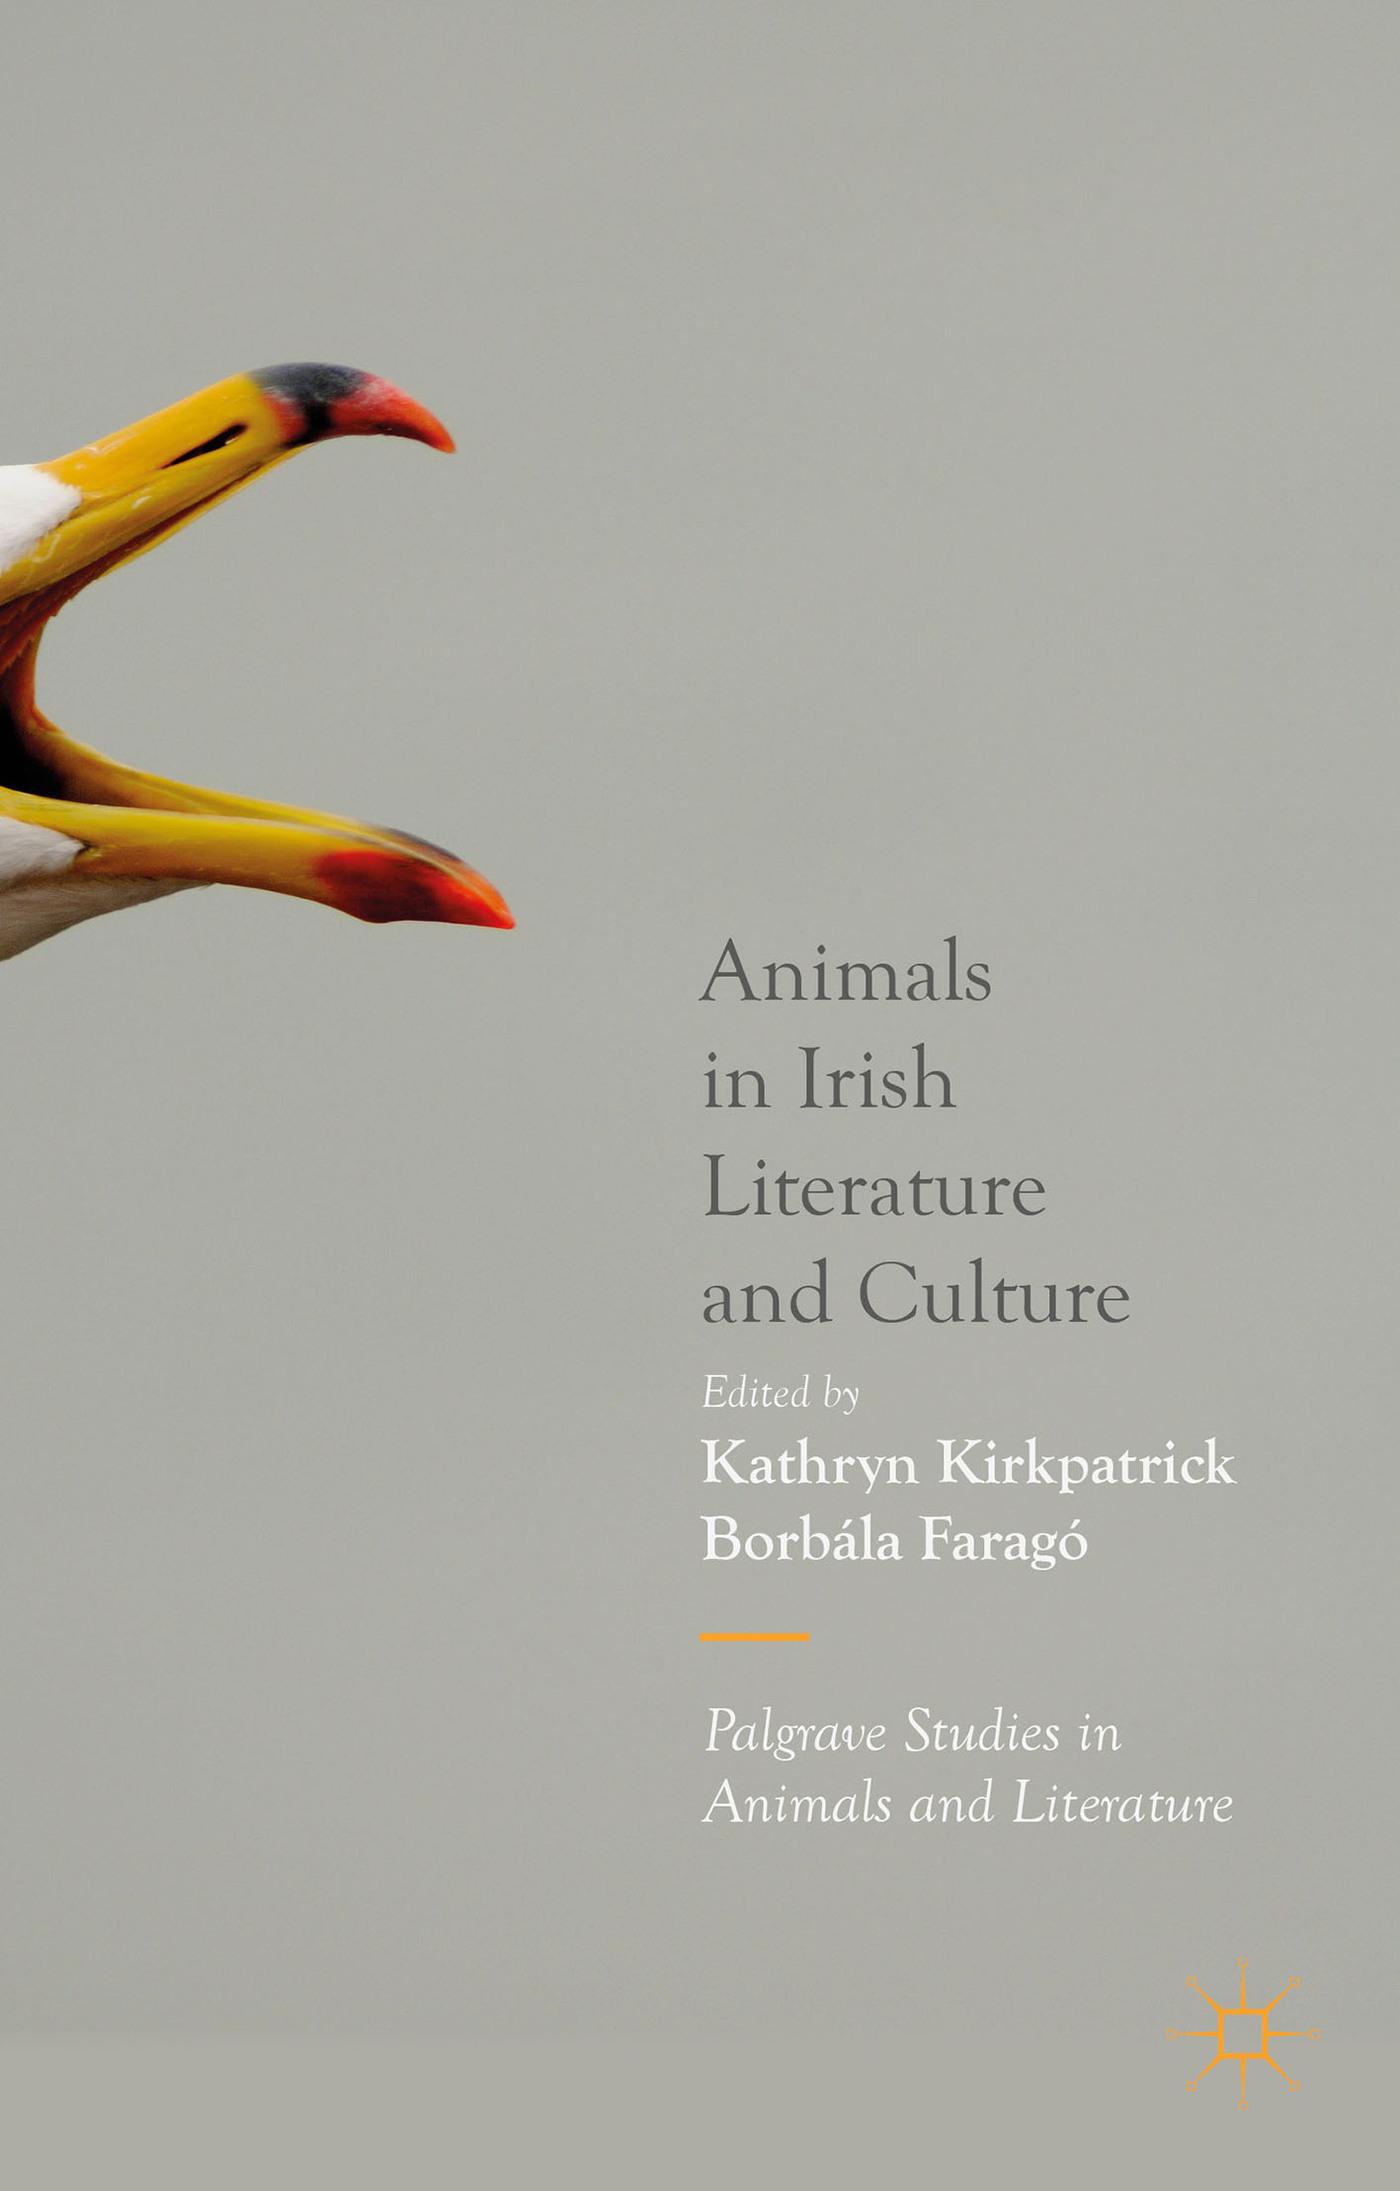 Animals in Irish Literature and Culture  by  Kathryn Kirkpatrick